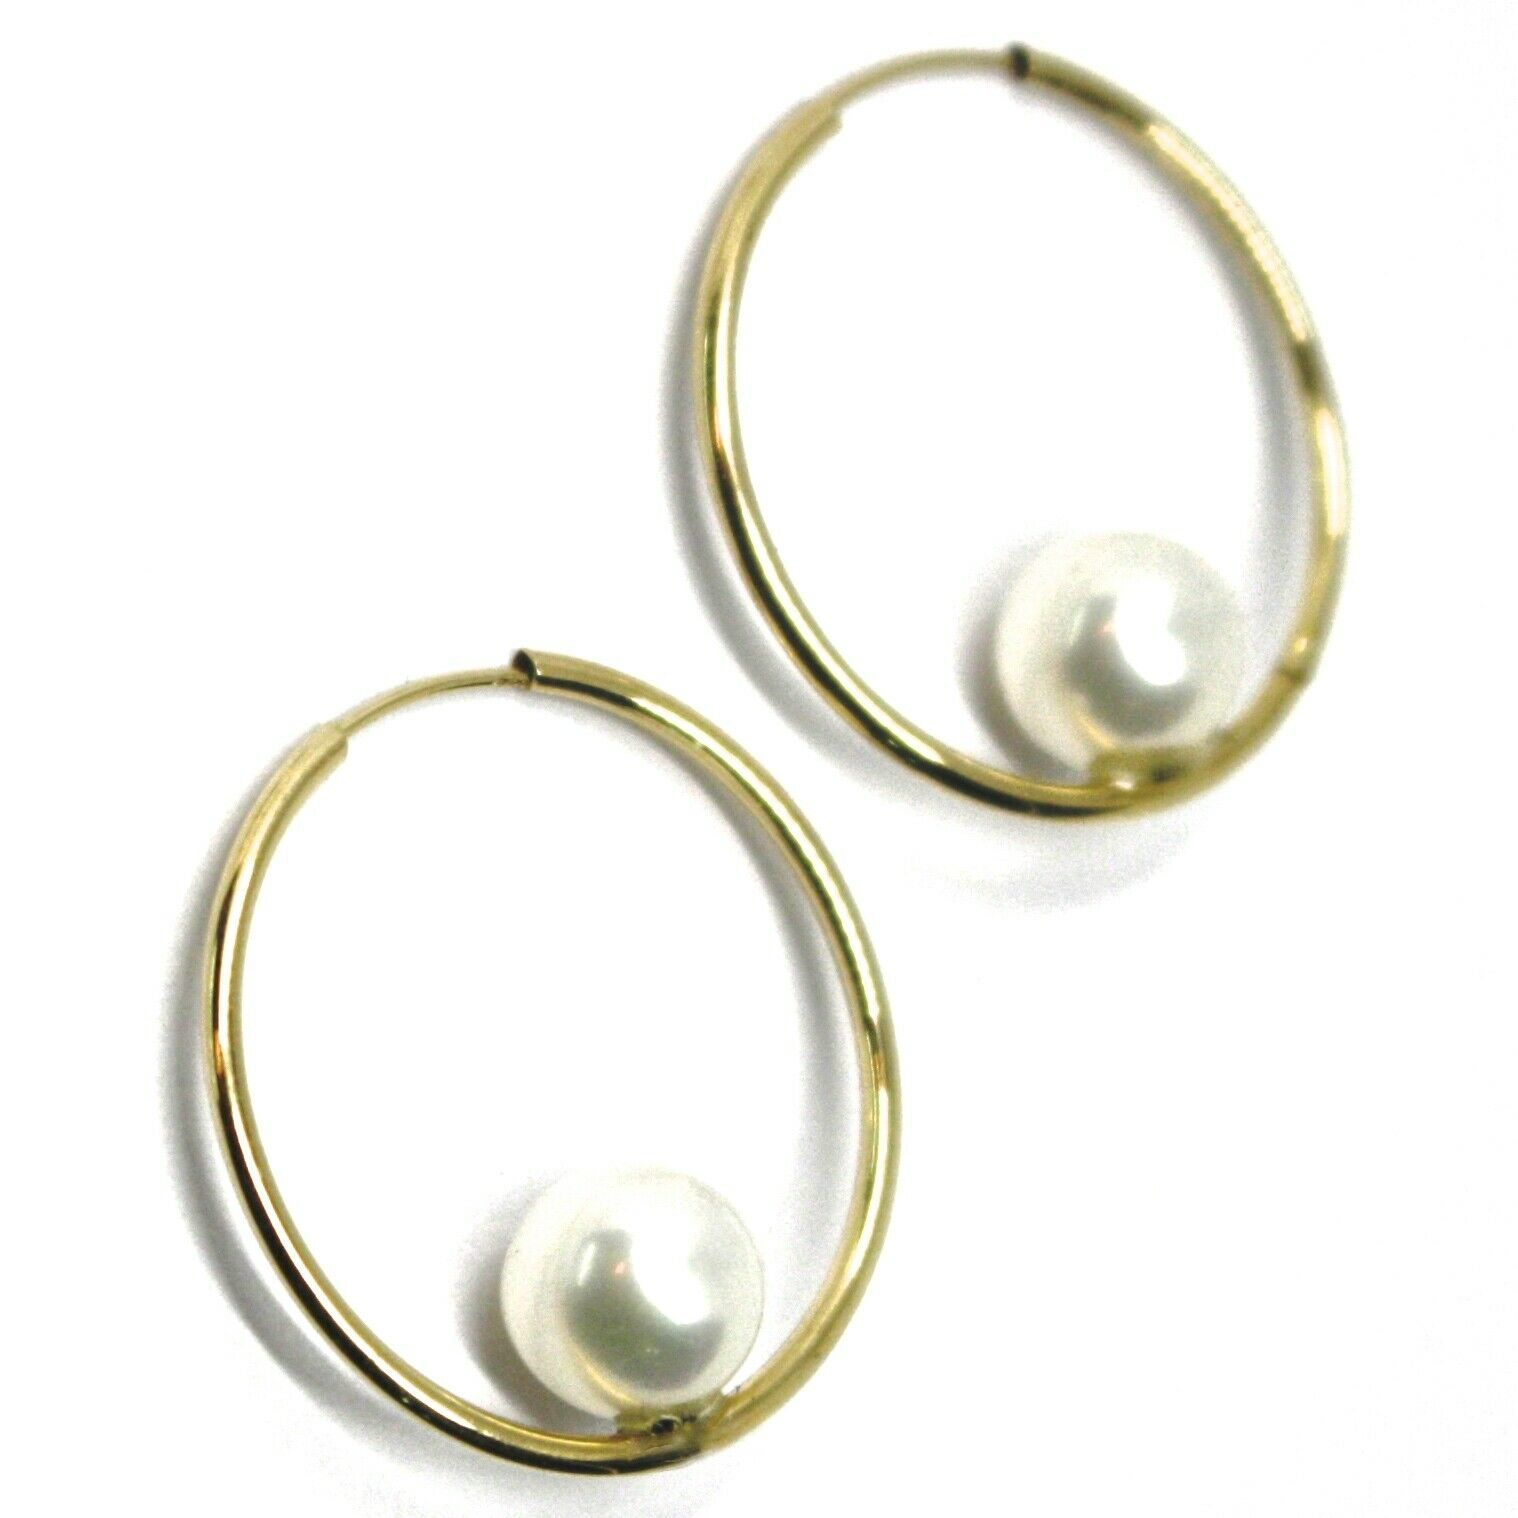 18K YELLOW GOLD CIRCLE HOOPS EARRINGS, TUBE 1mm, DIAMETER 2.5cm, HANGING PEARL